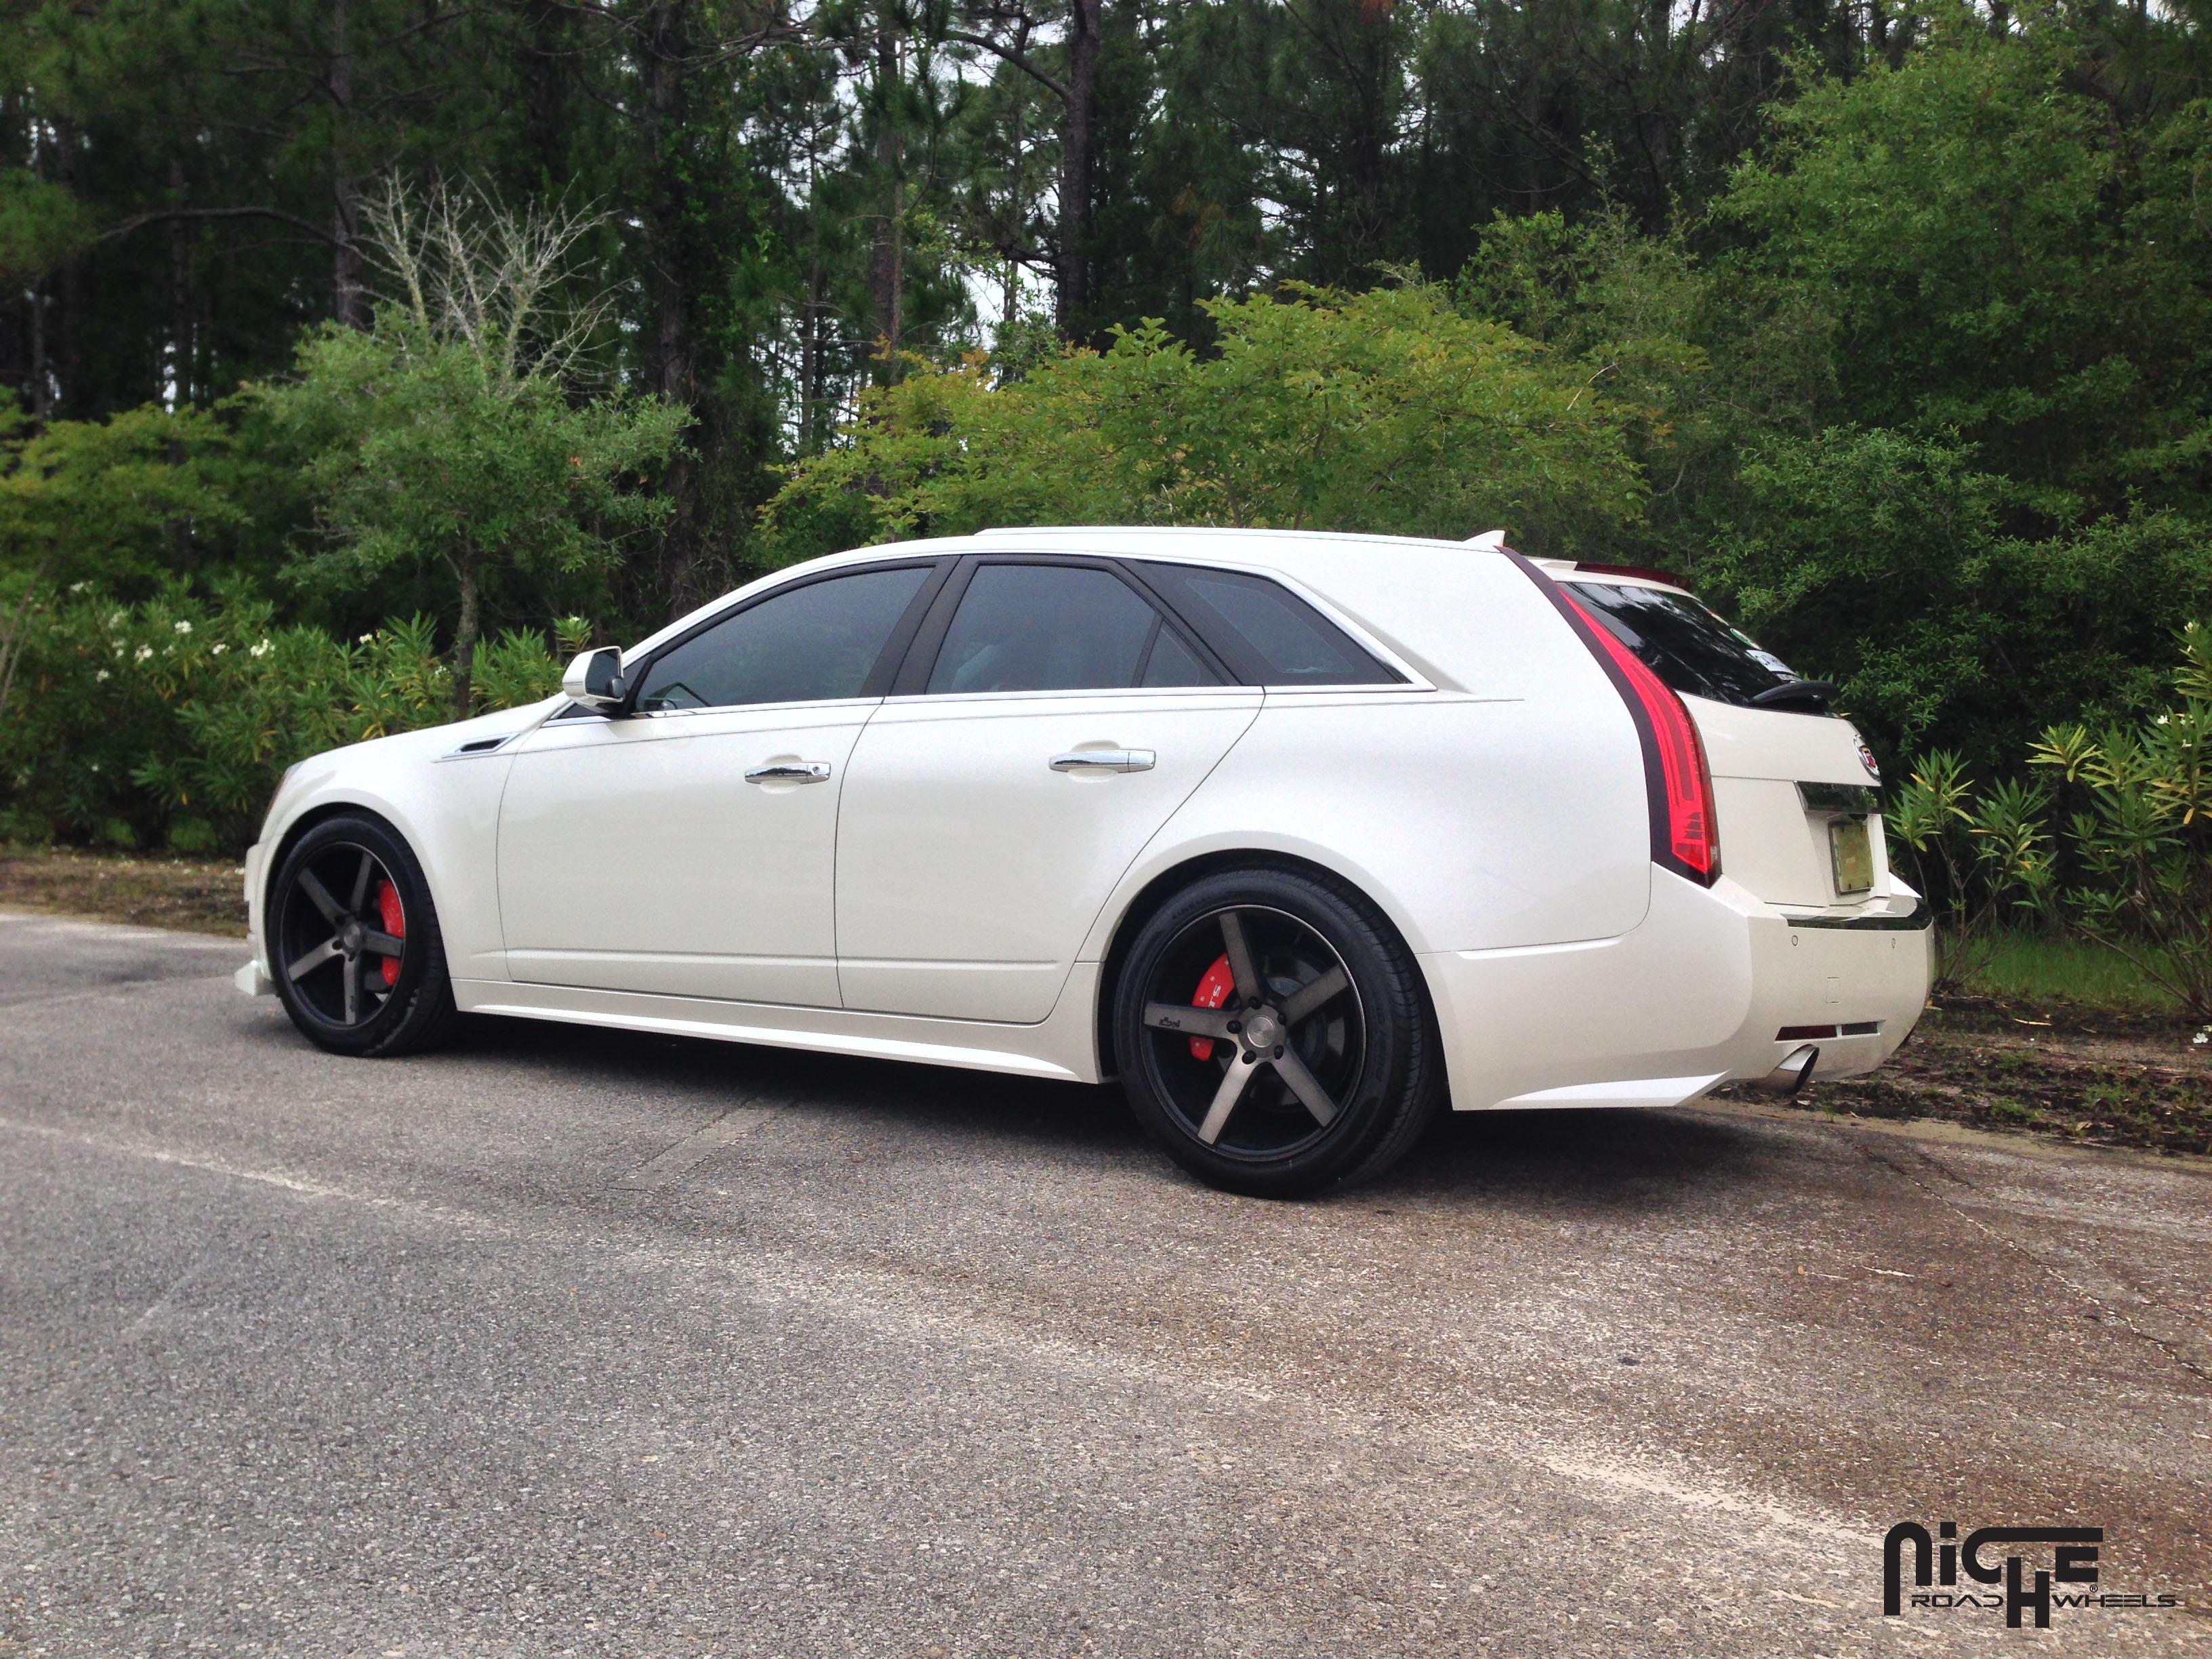 Cadillac cts wagon milan m134 gallery mht wheels inc